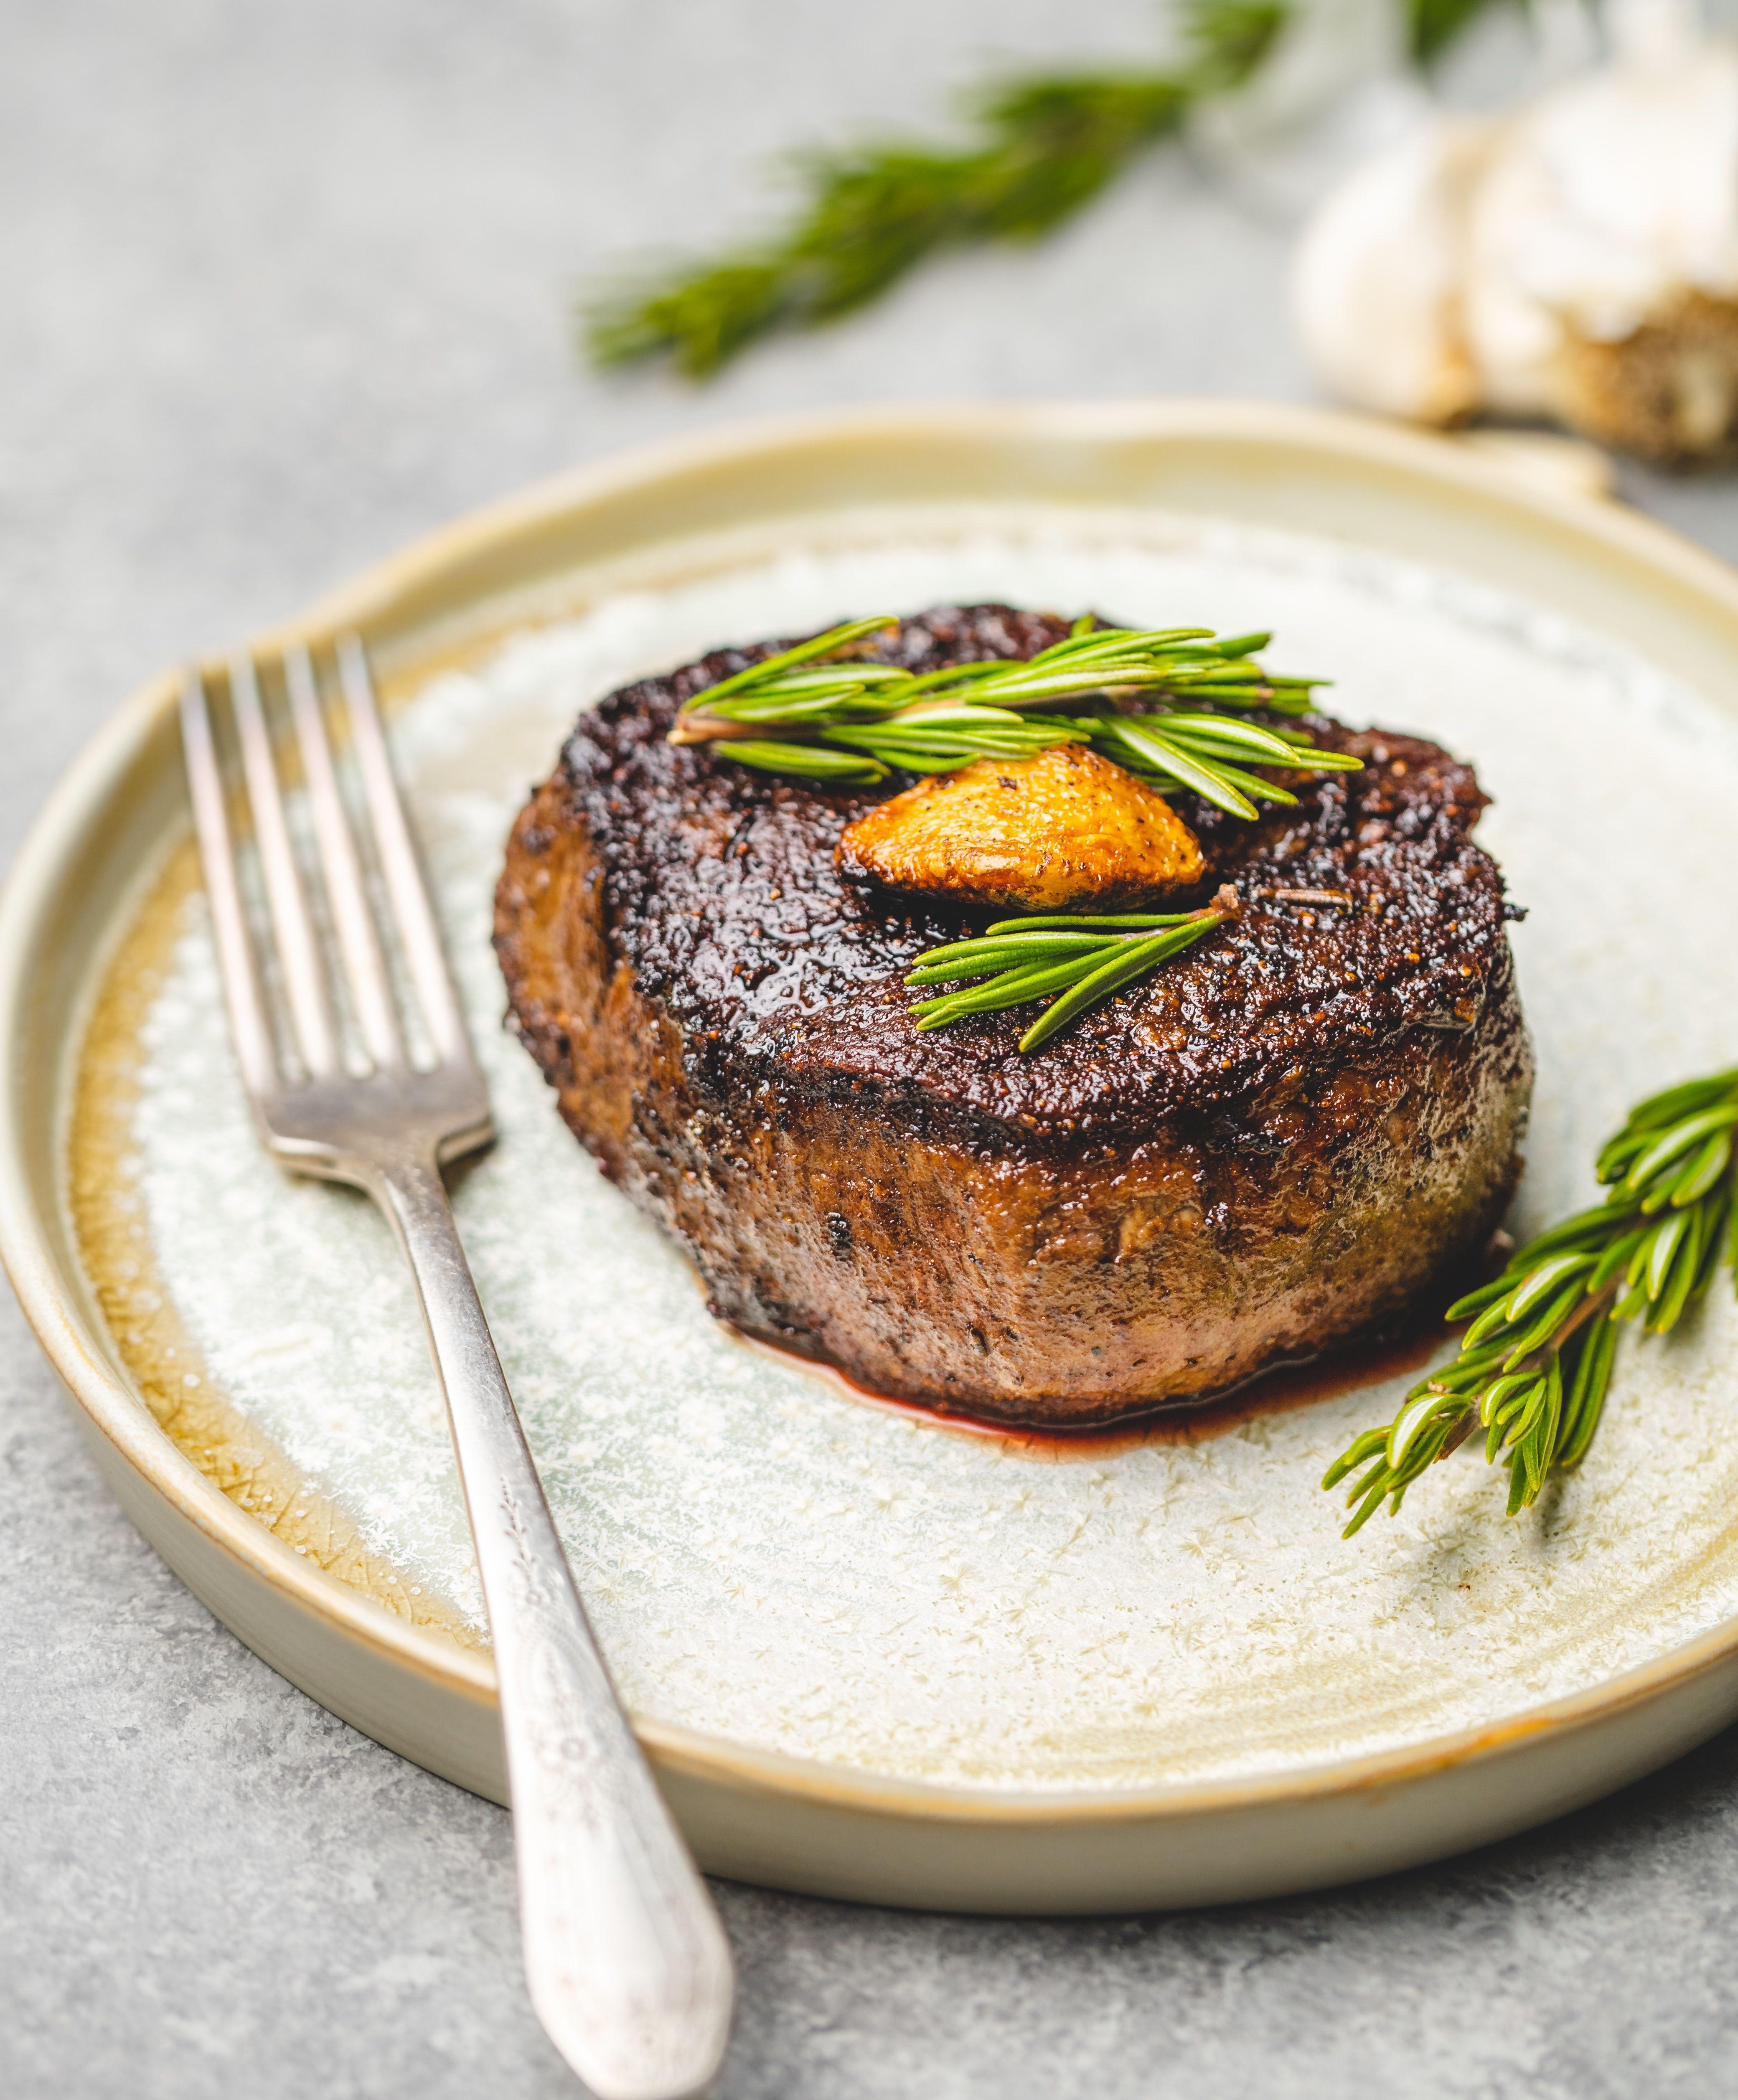 Steak_chad-montano-m0luxglnlfk-unsplash